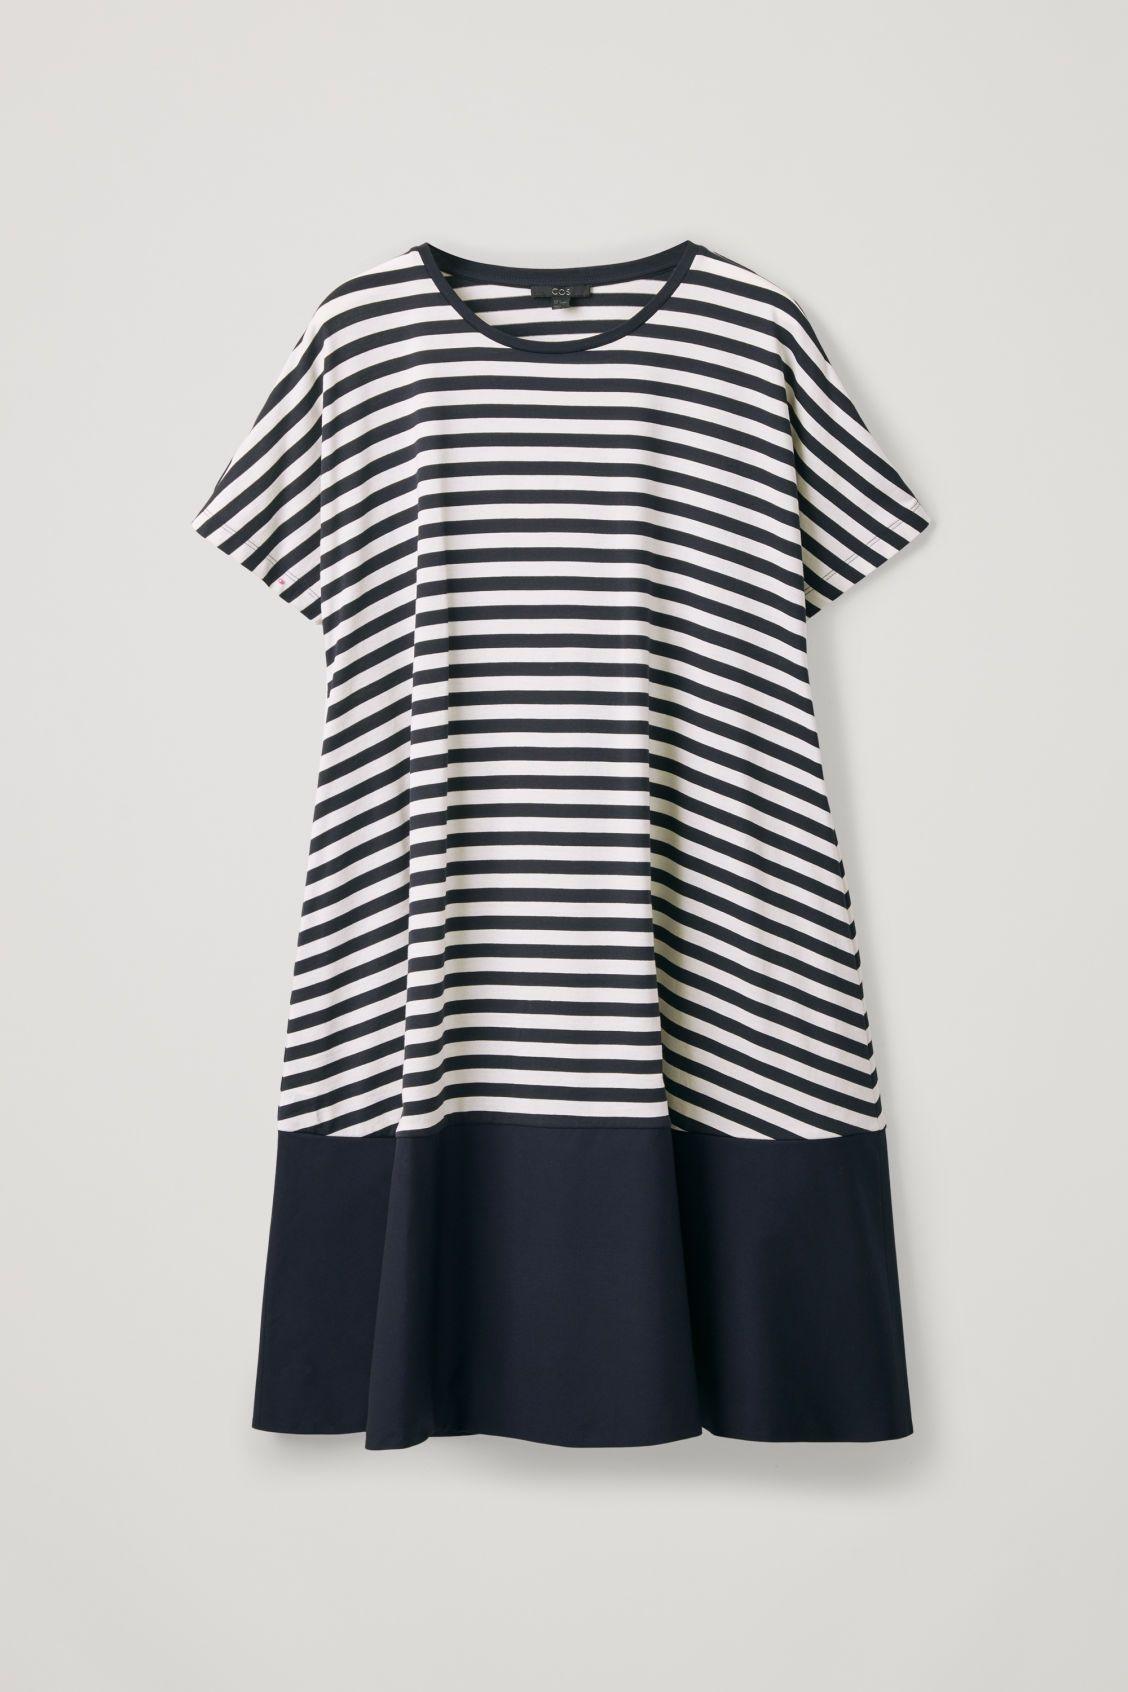 b560176e1325 CONTRAST-PANELLED JERSEY DRESS - Blue - Dresses - COS | COS Spring ...